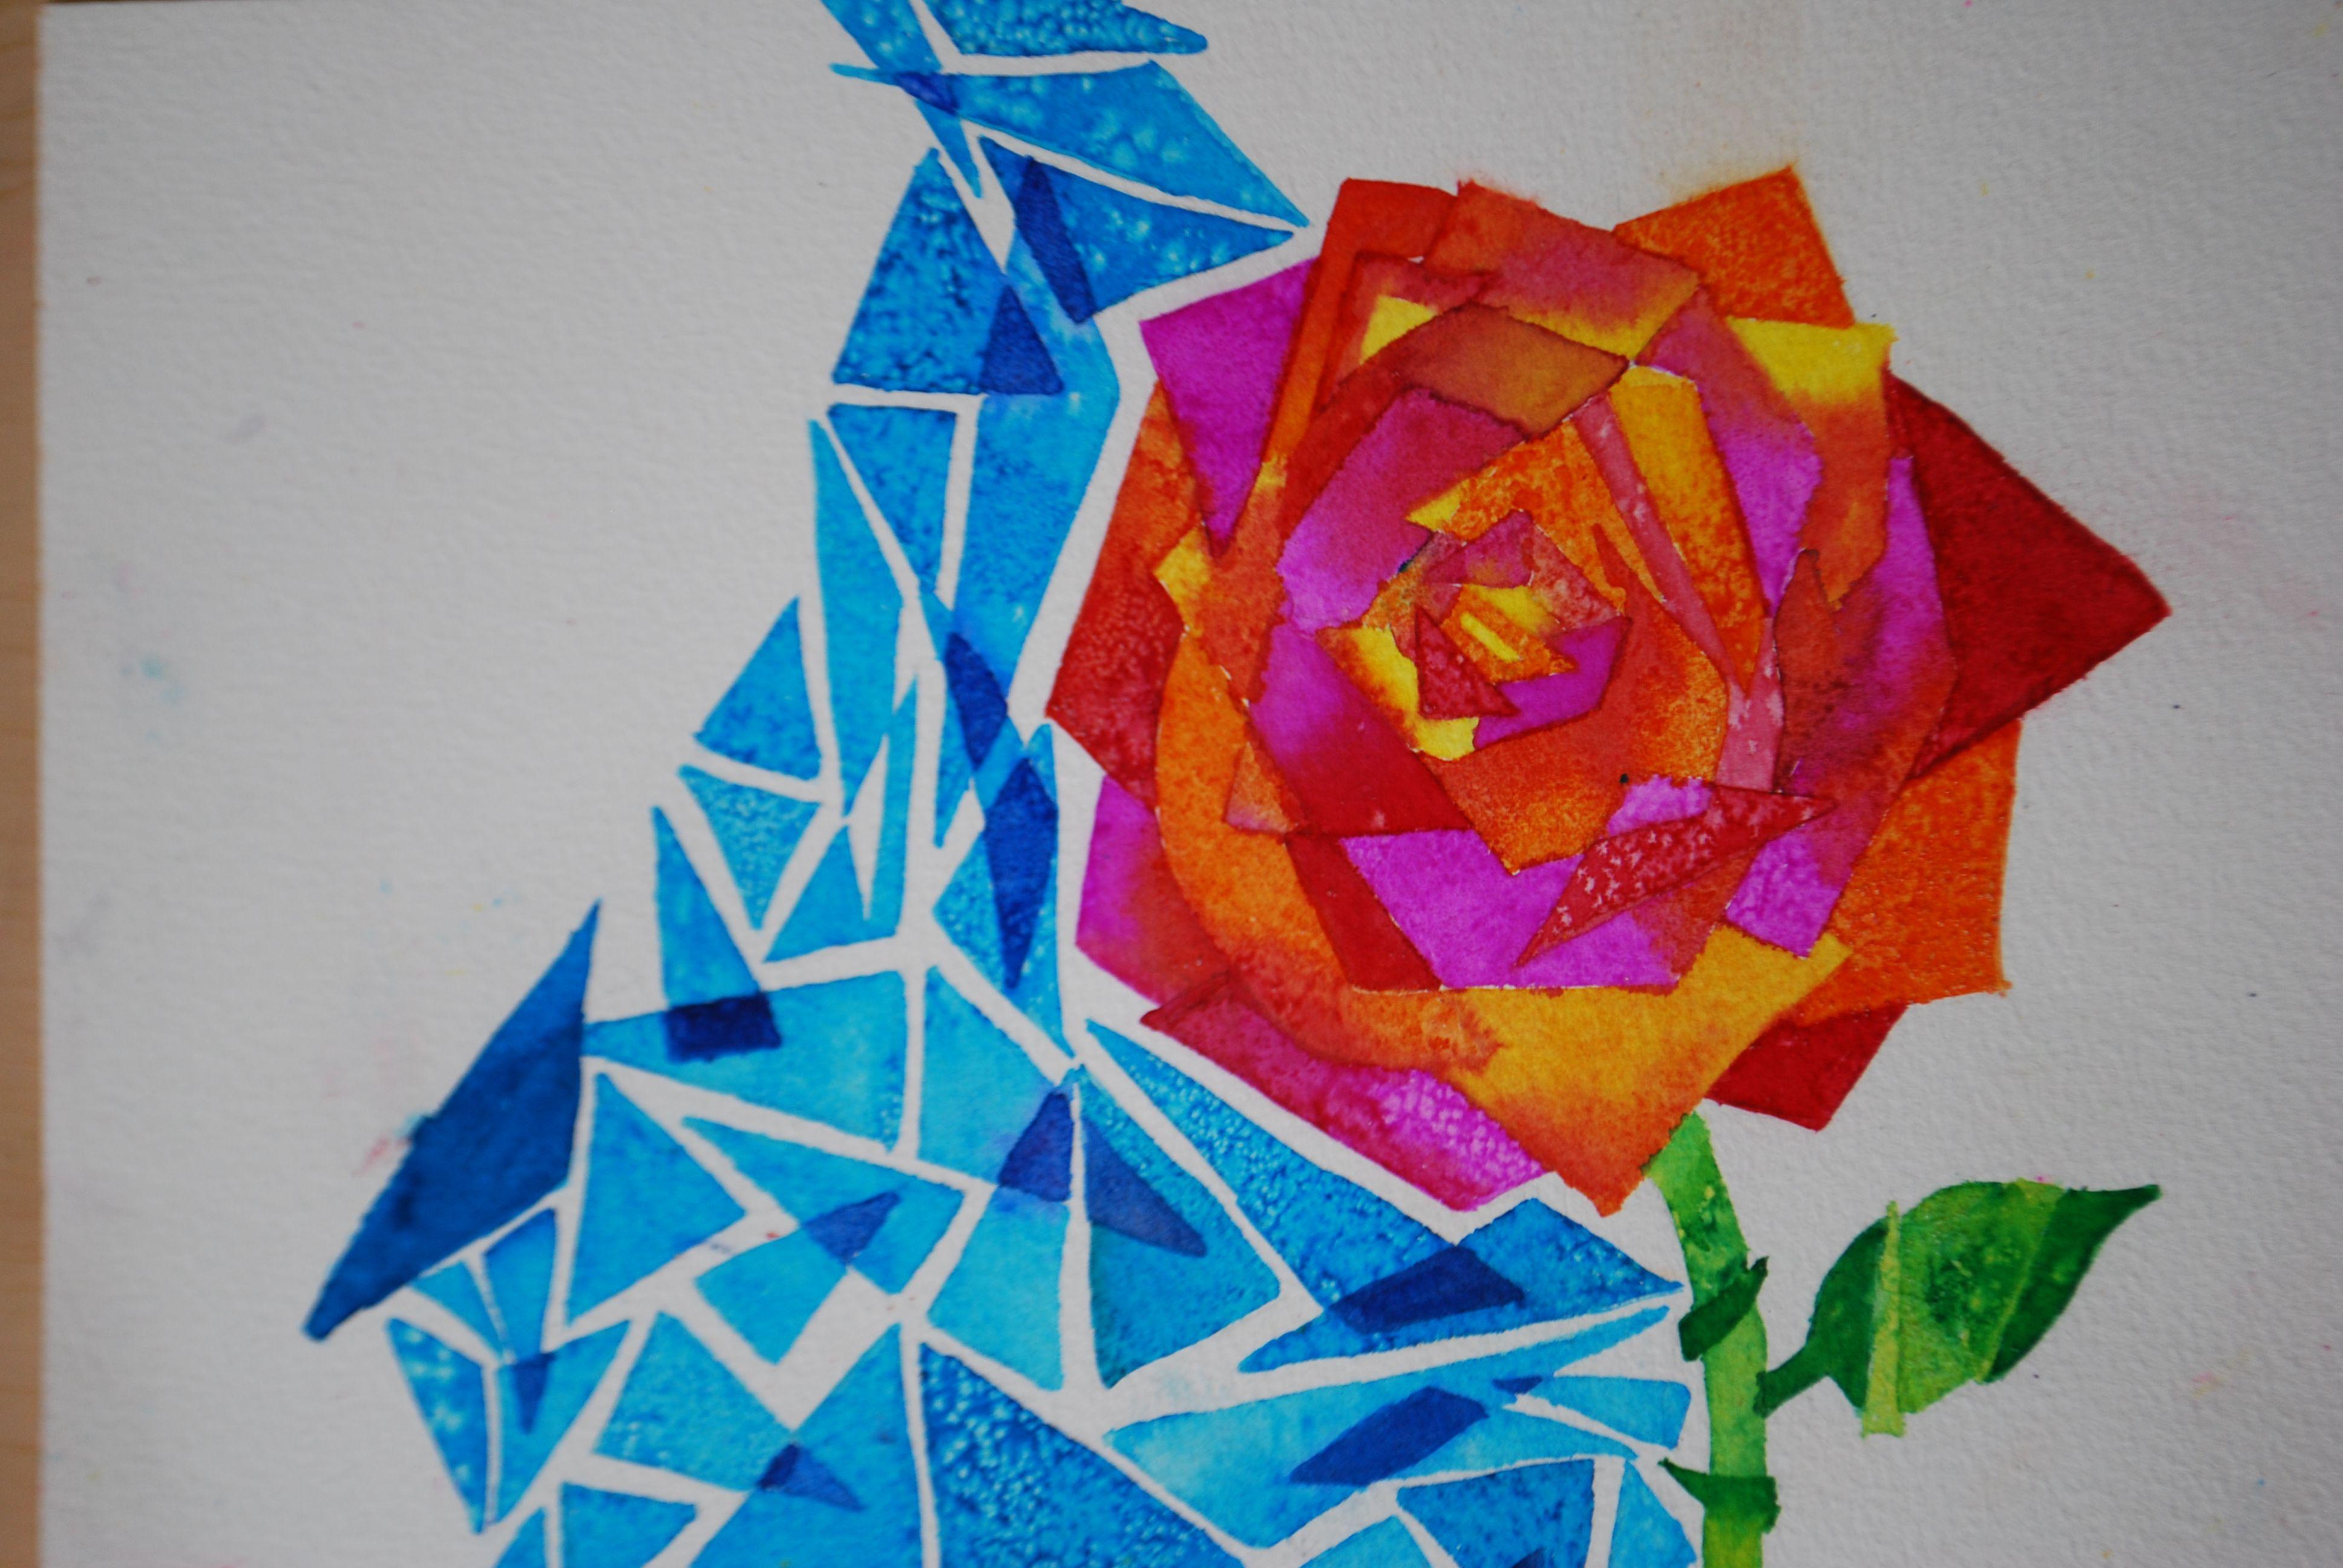 Watercolor Salt Painting Middle School Art Project